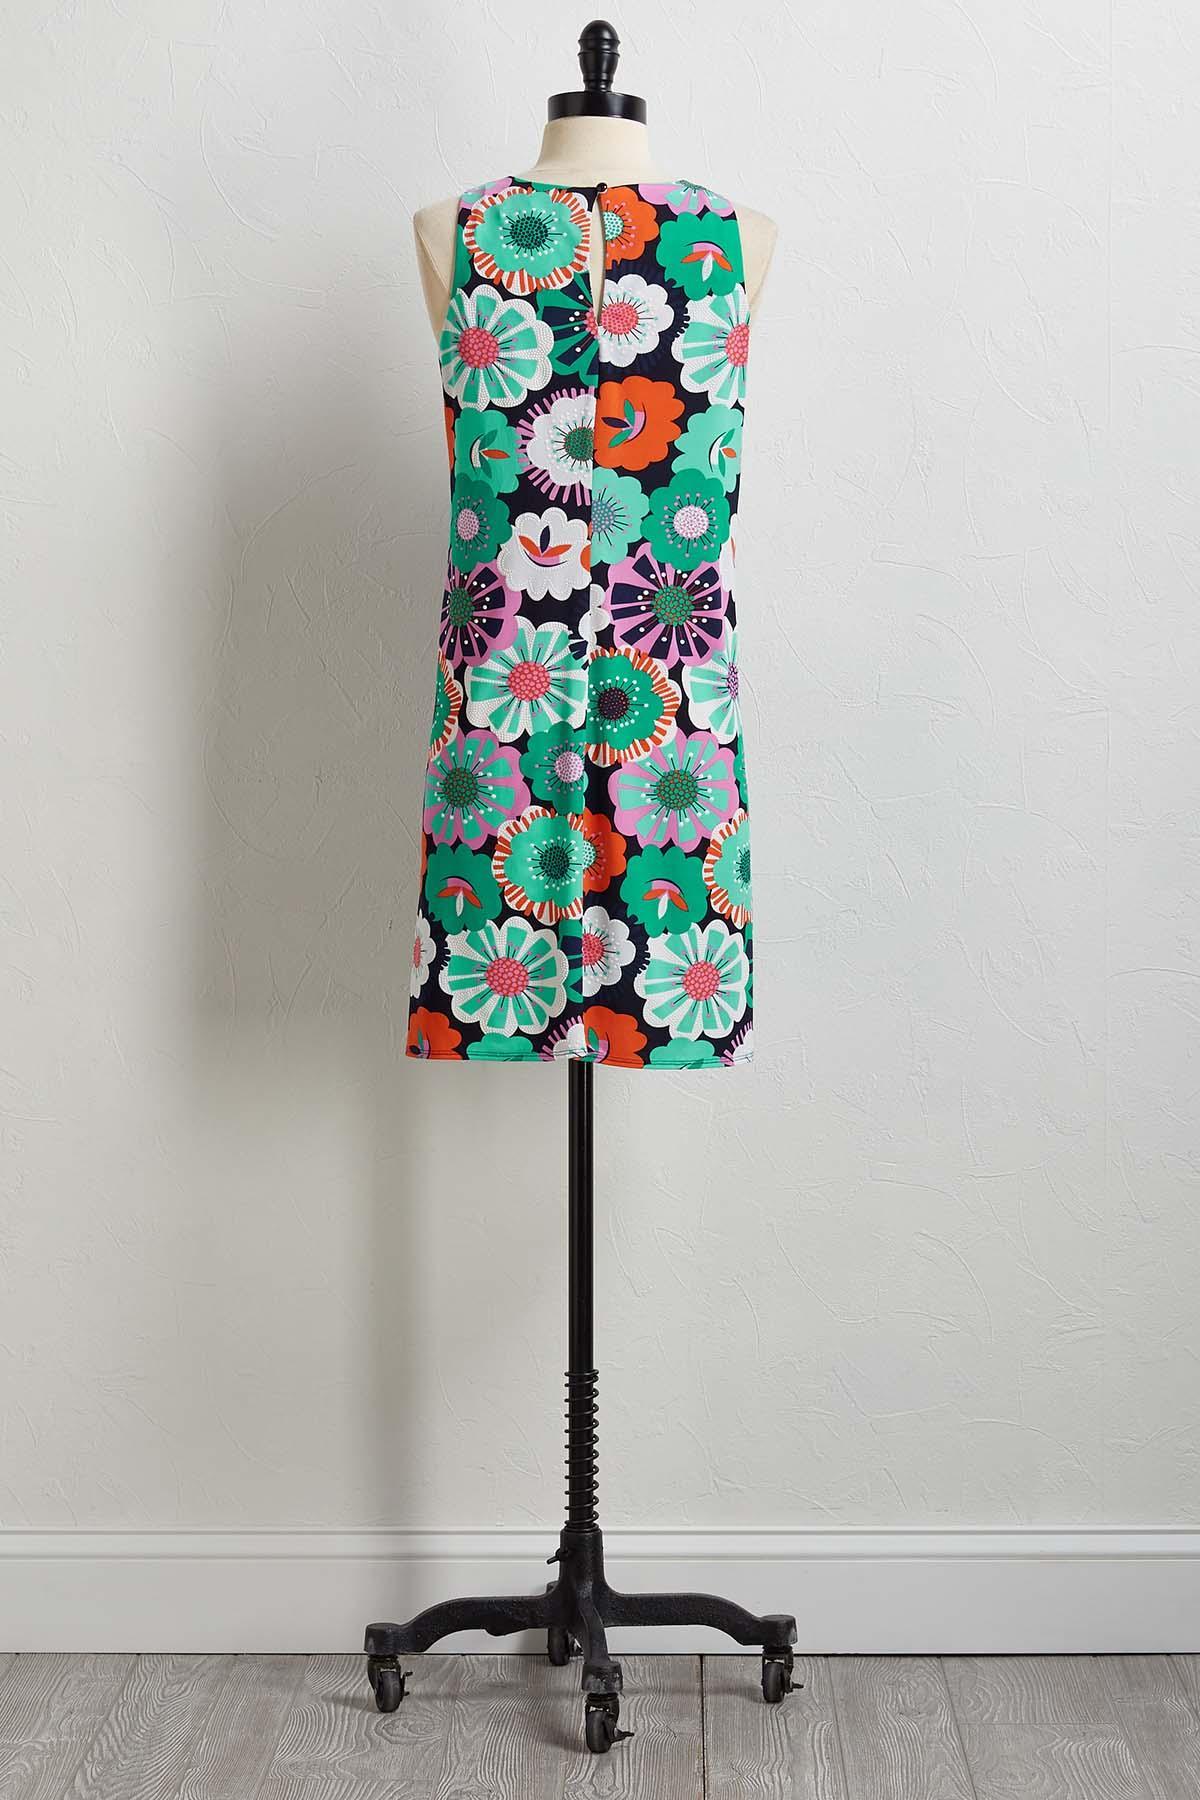 Floral Textured Print Shift Dress